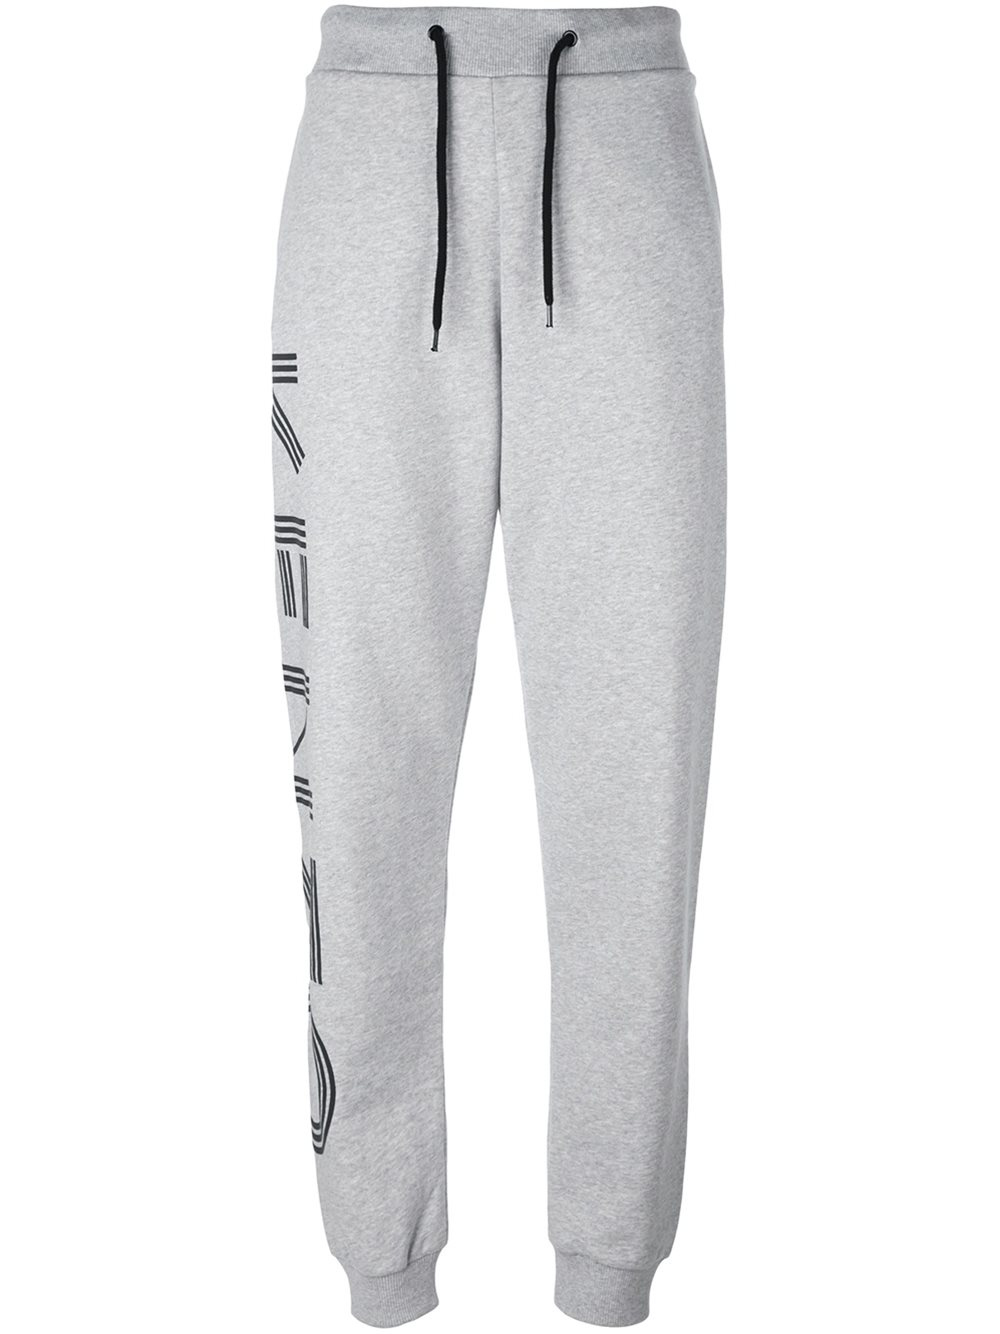 Kenzo logo print gray track pants